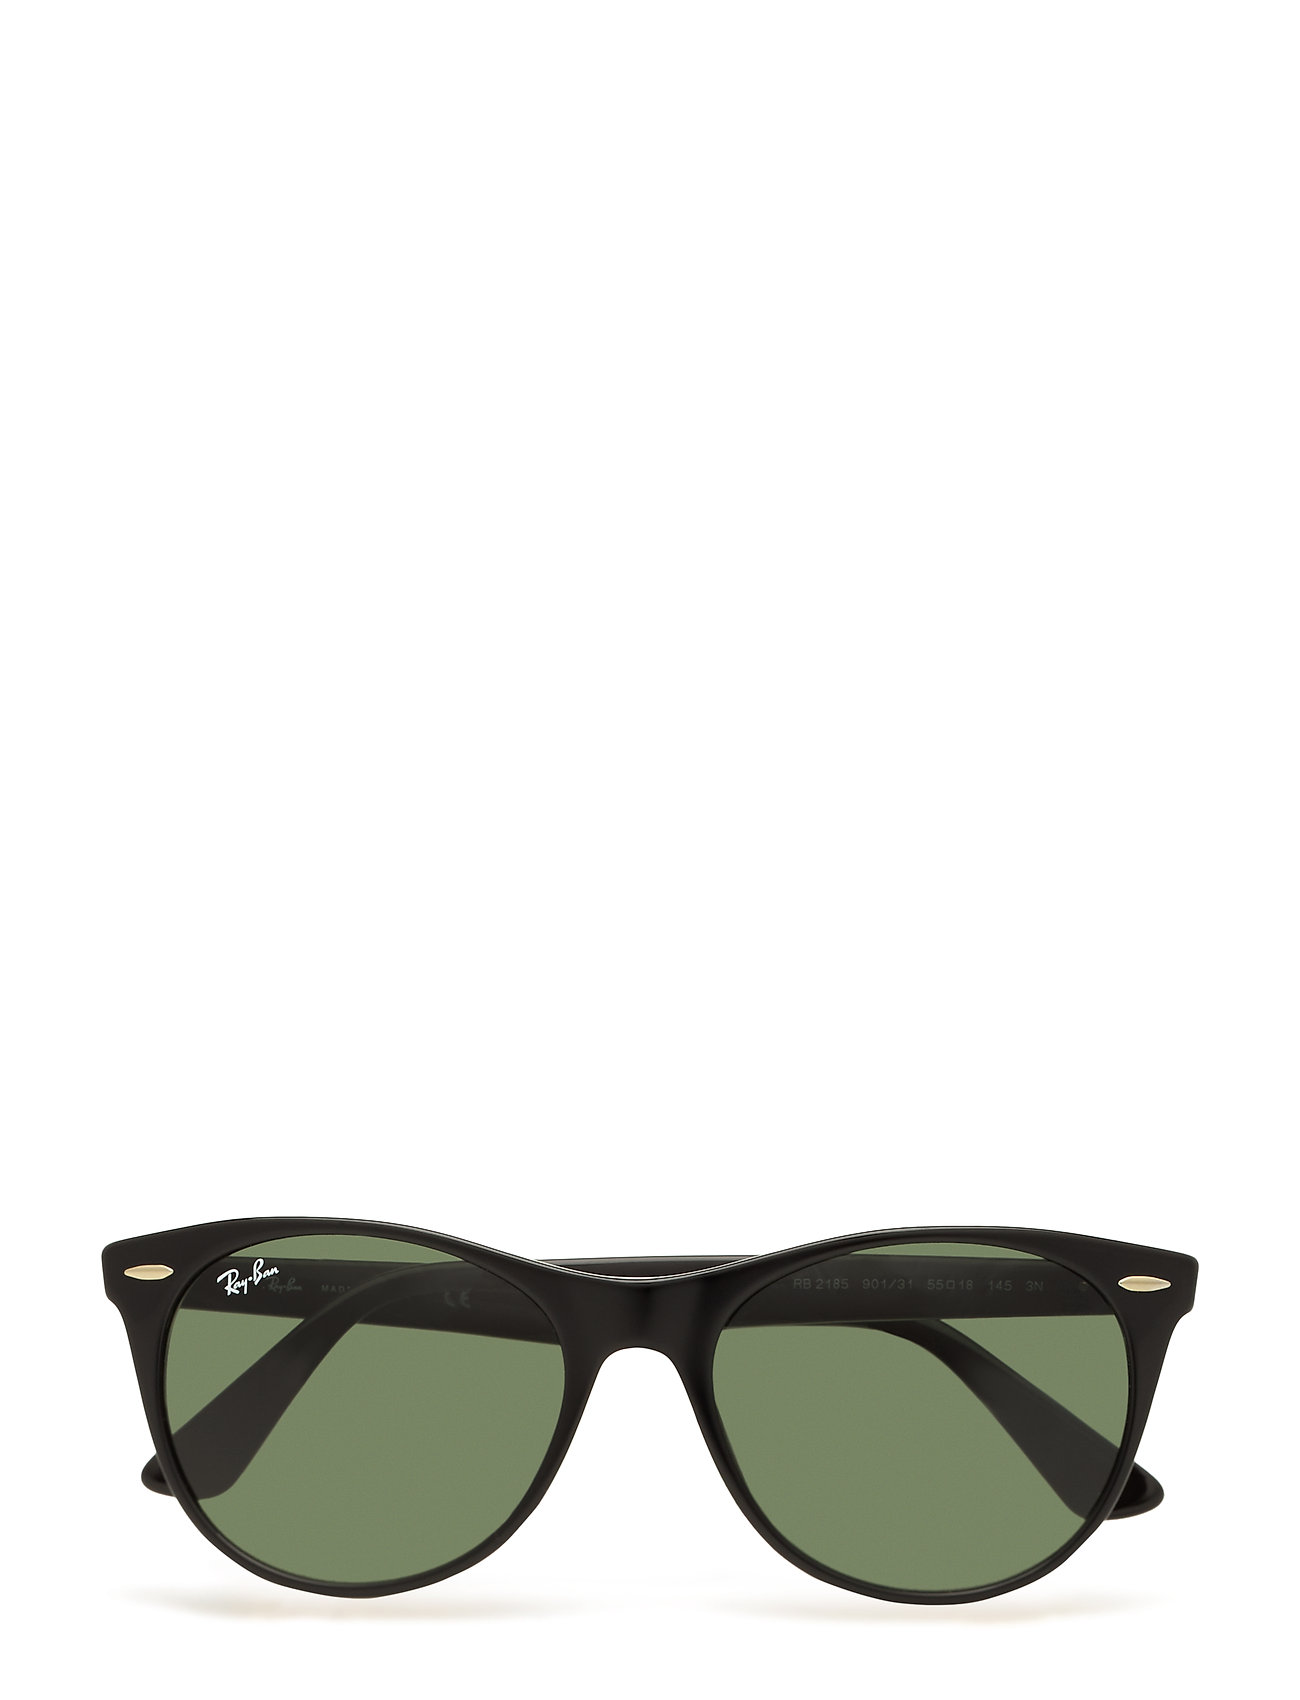 Image of Ray-Ban Sunglasses Solbriller Sort Ray-Ban (3293916245)